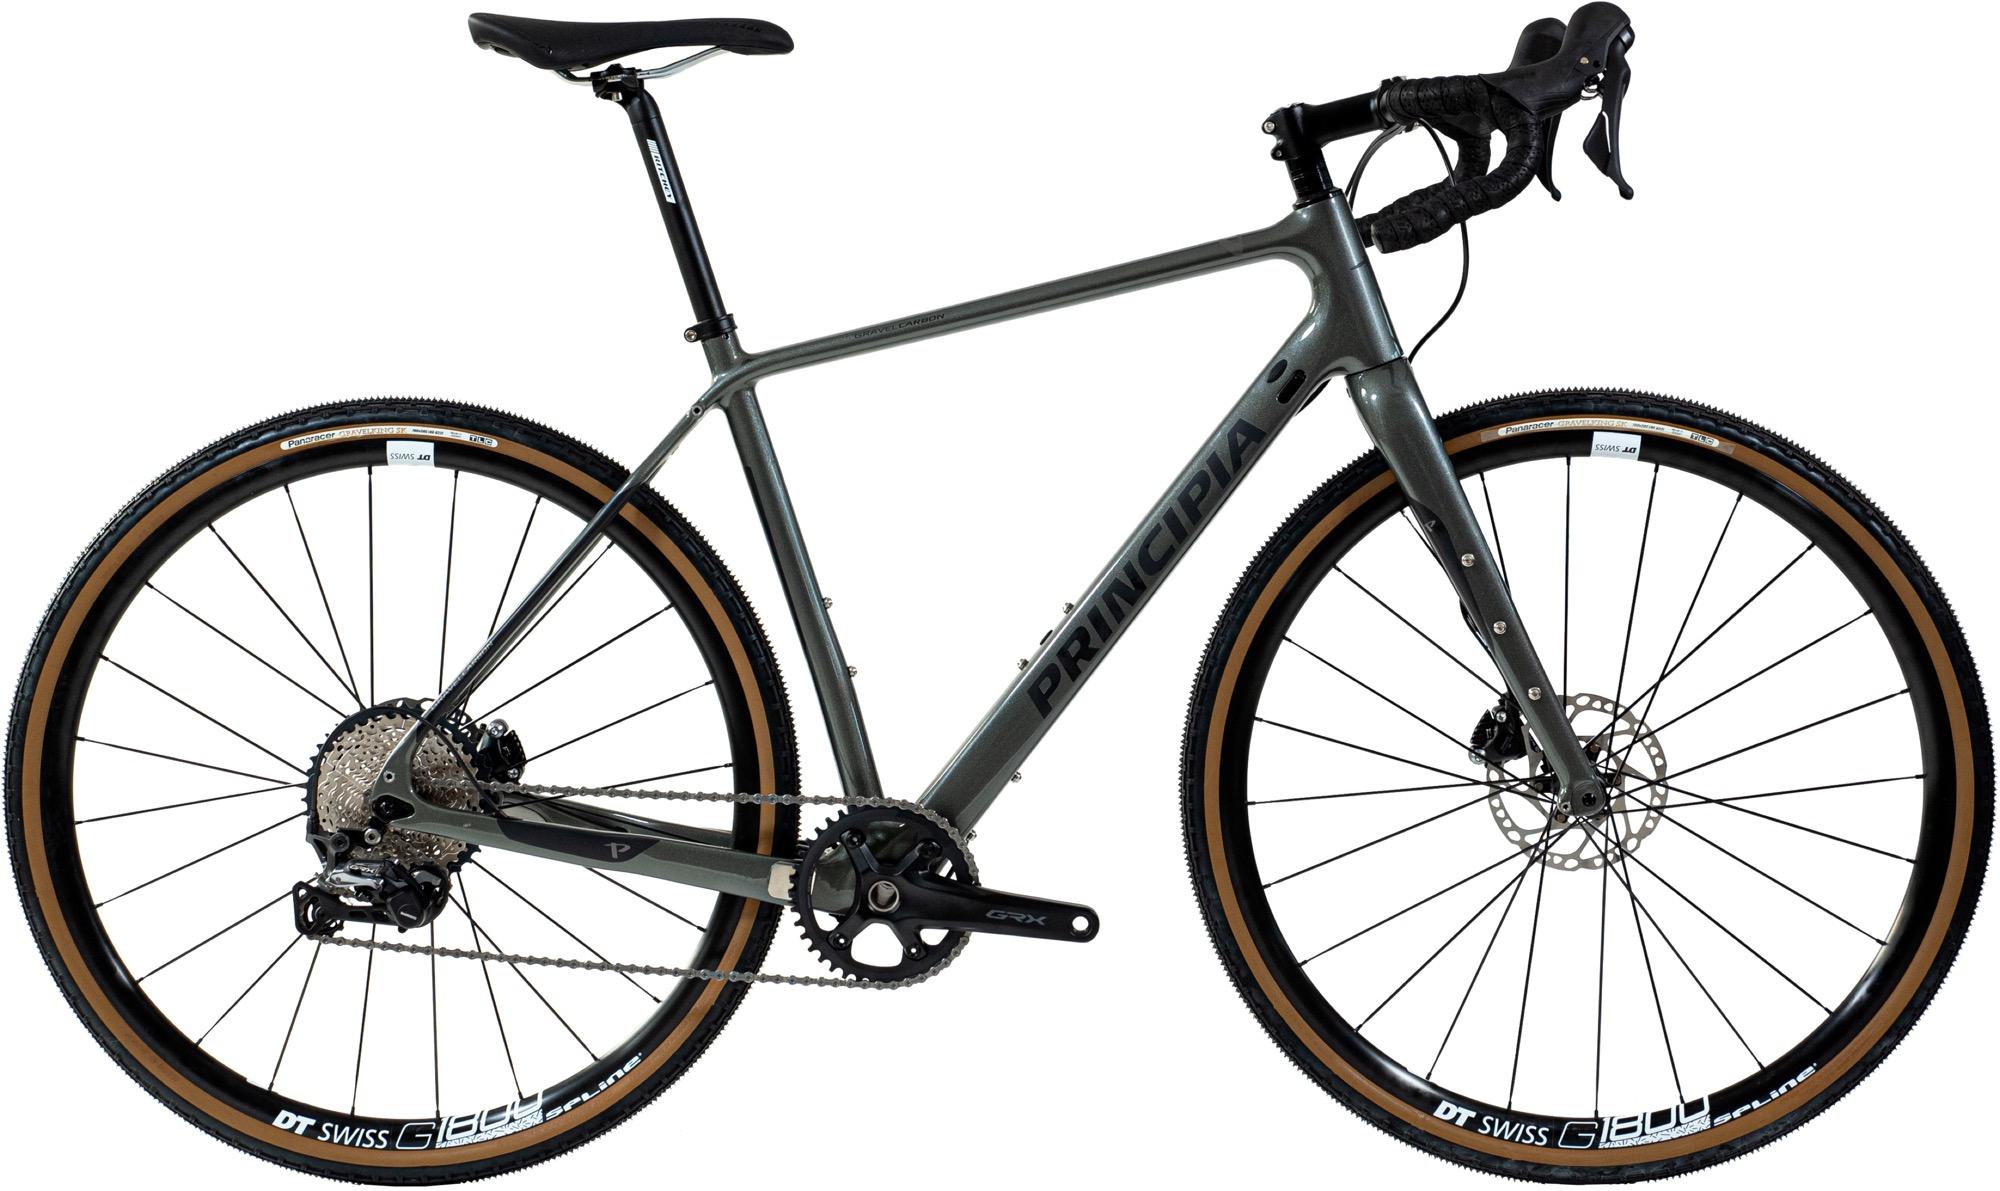 Køb Principia Gravel Carbon Shimano GRX RX812 1x11sp Titanium – 2020